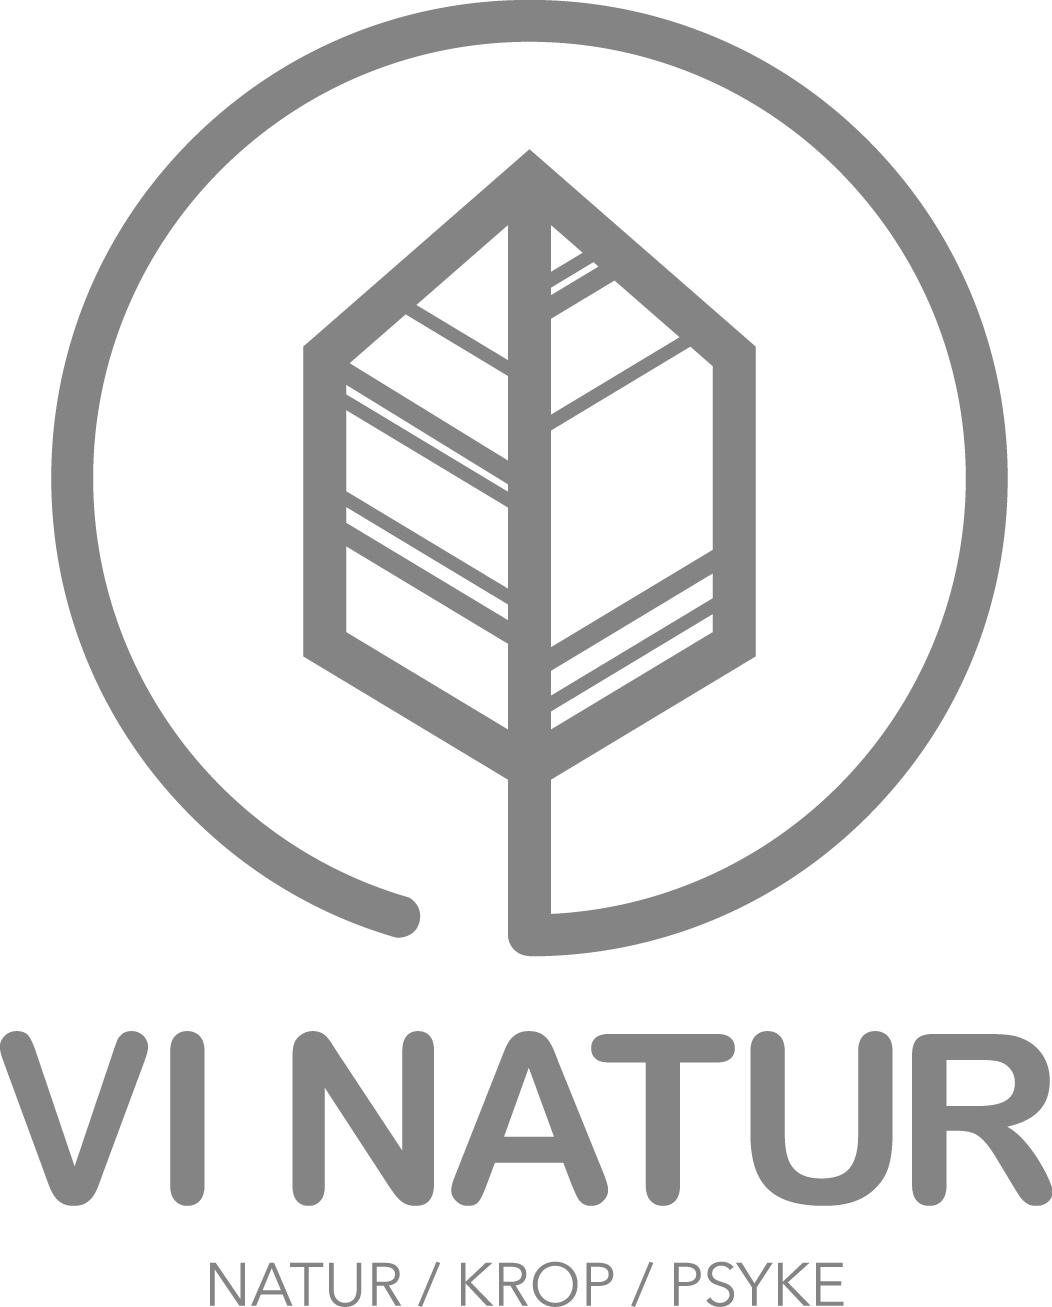 vinatur_logo_web_hvid.jpg